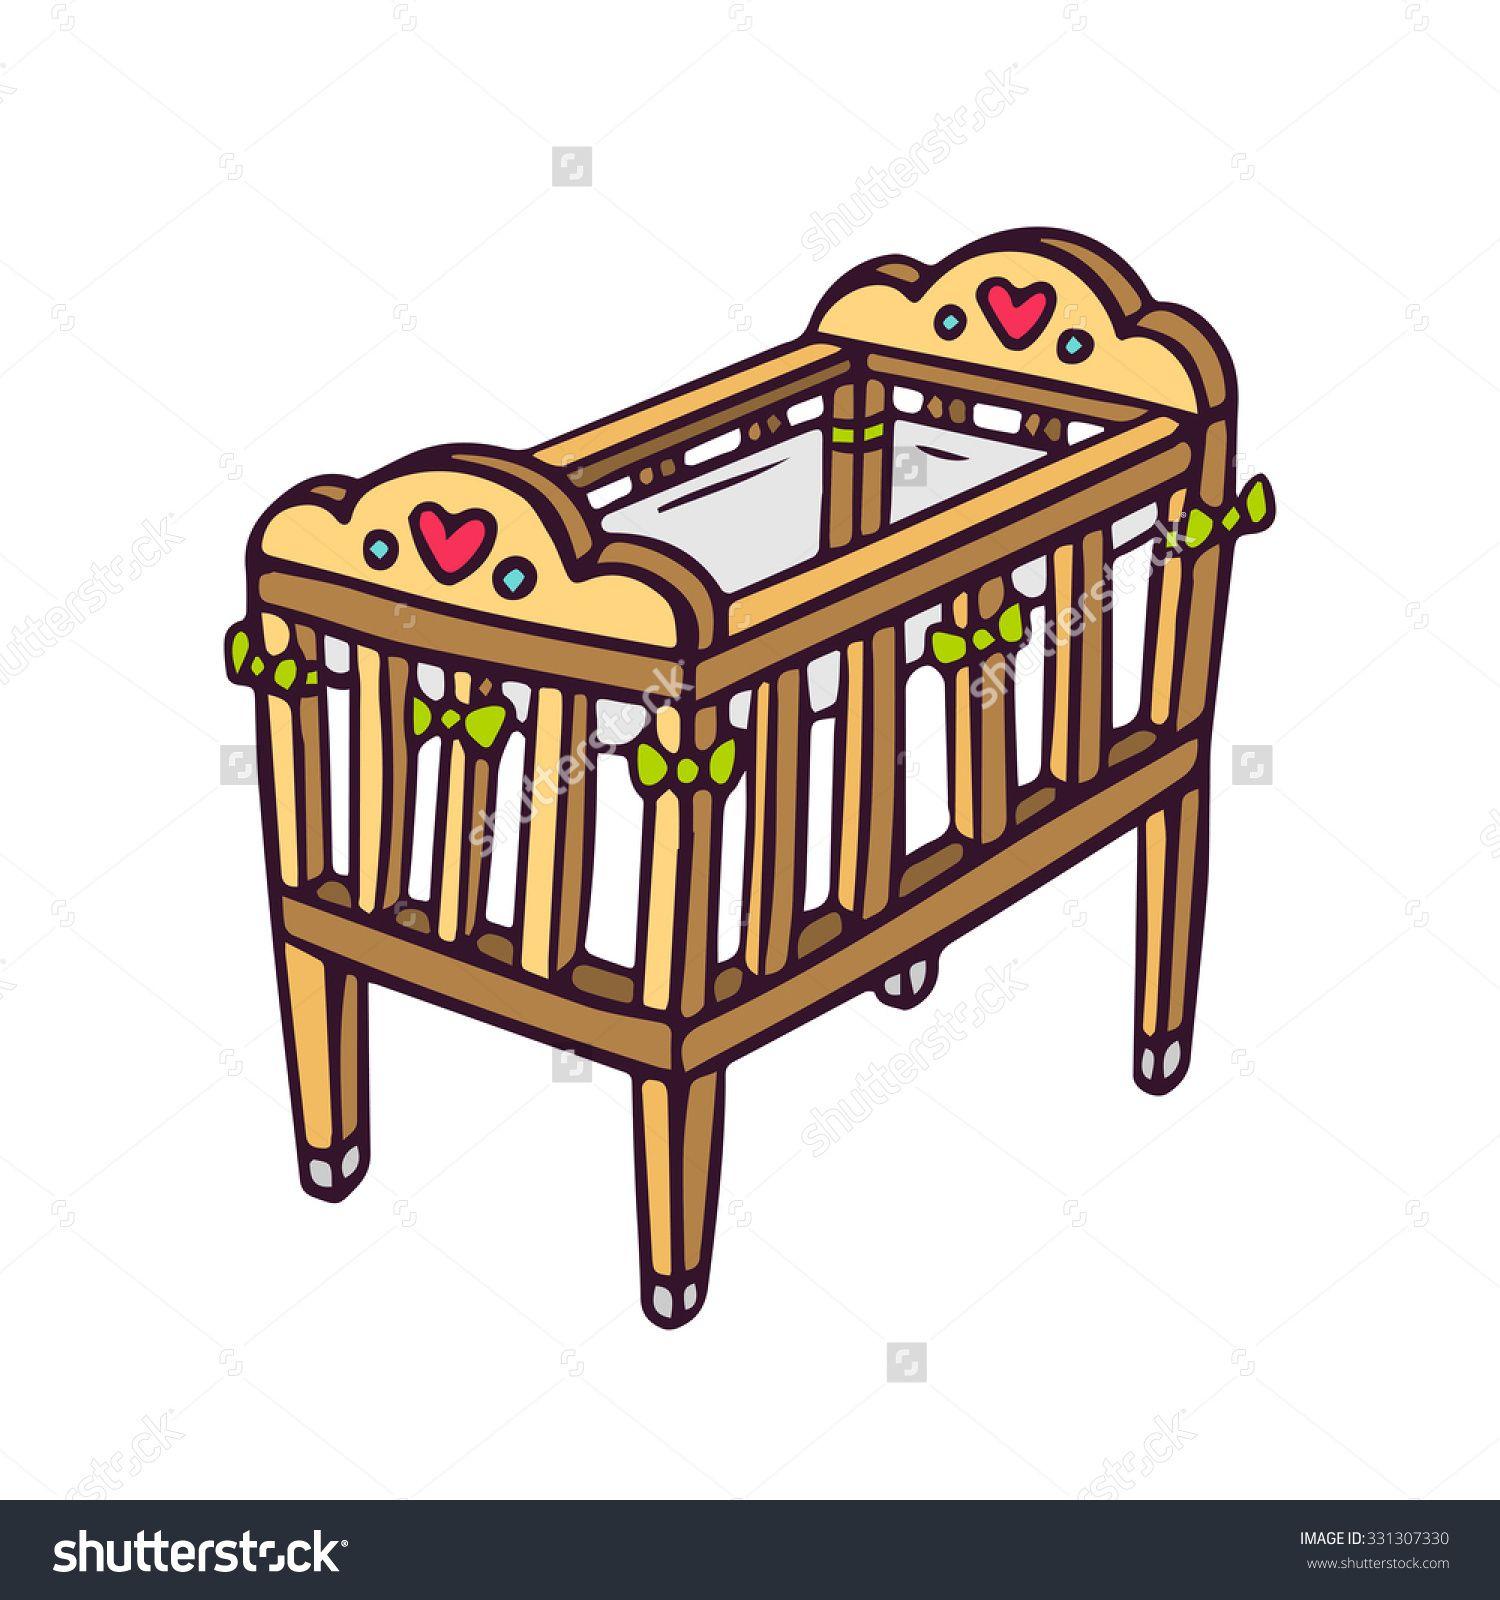 clipart cot clip arts galleries art gallery clip art baby cribs cot [ 1500 x 1600 Pixel ]